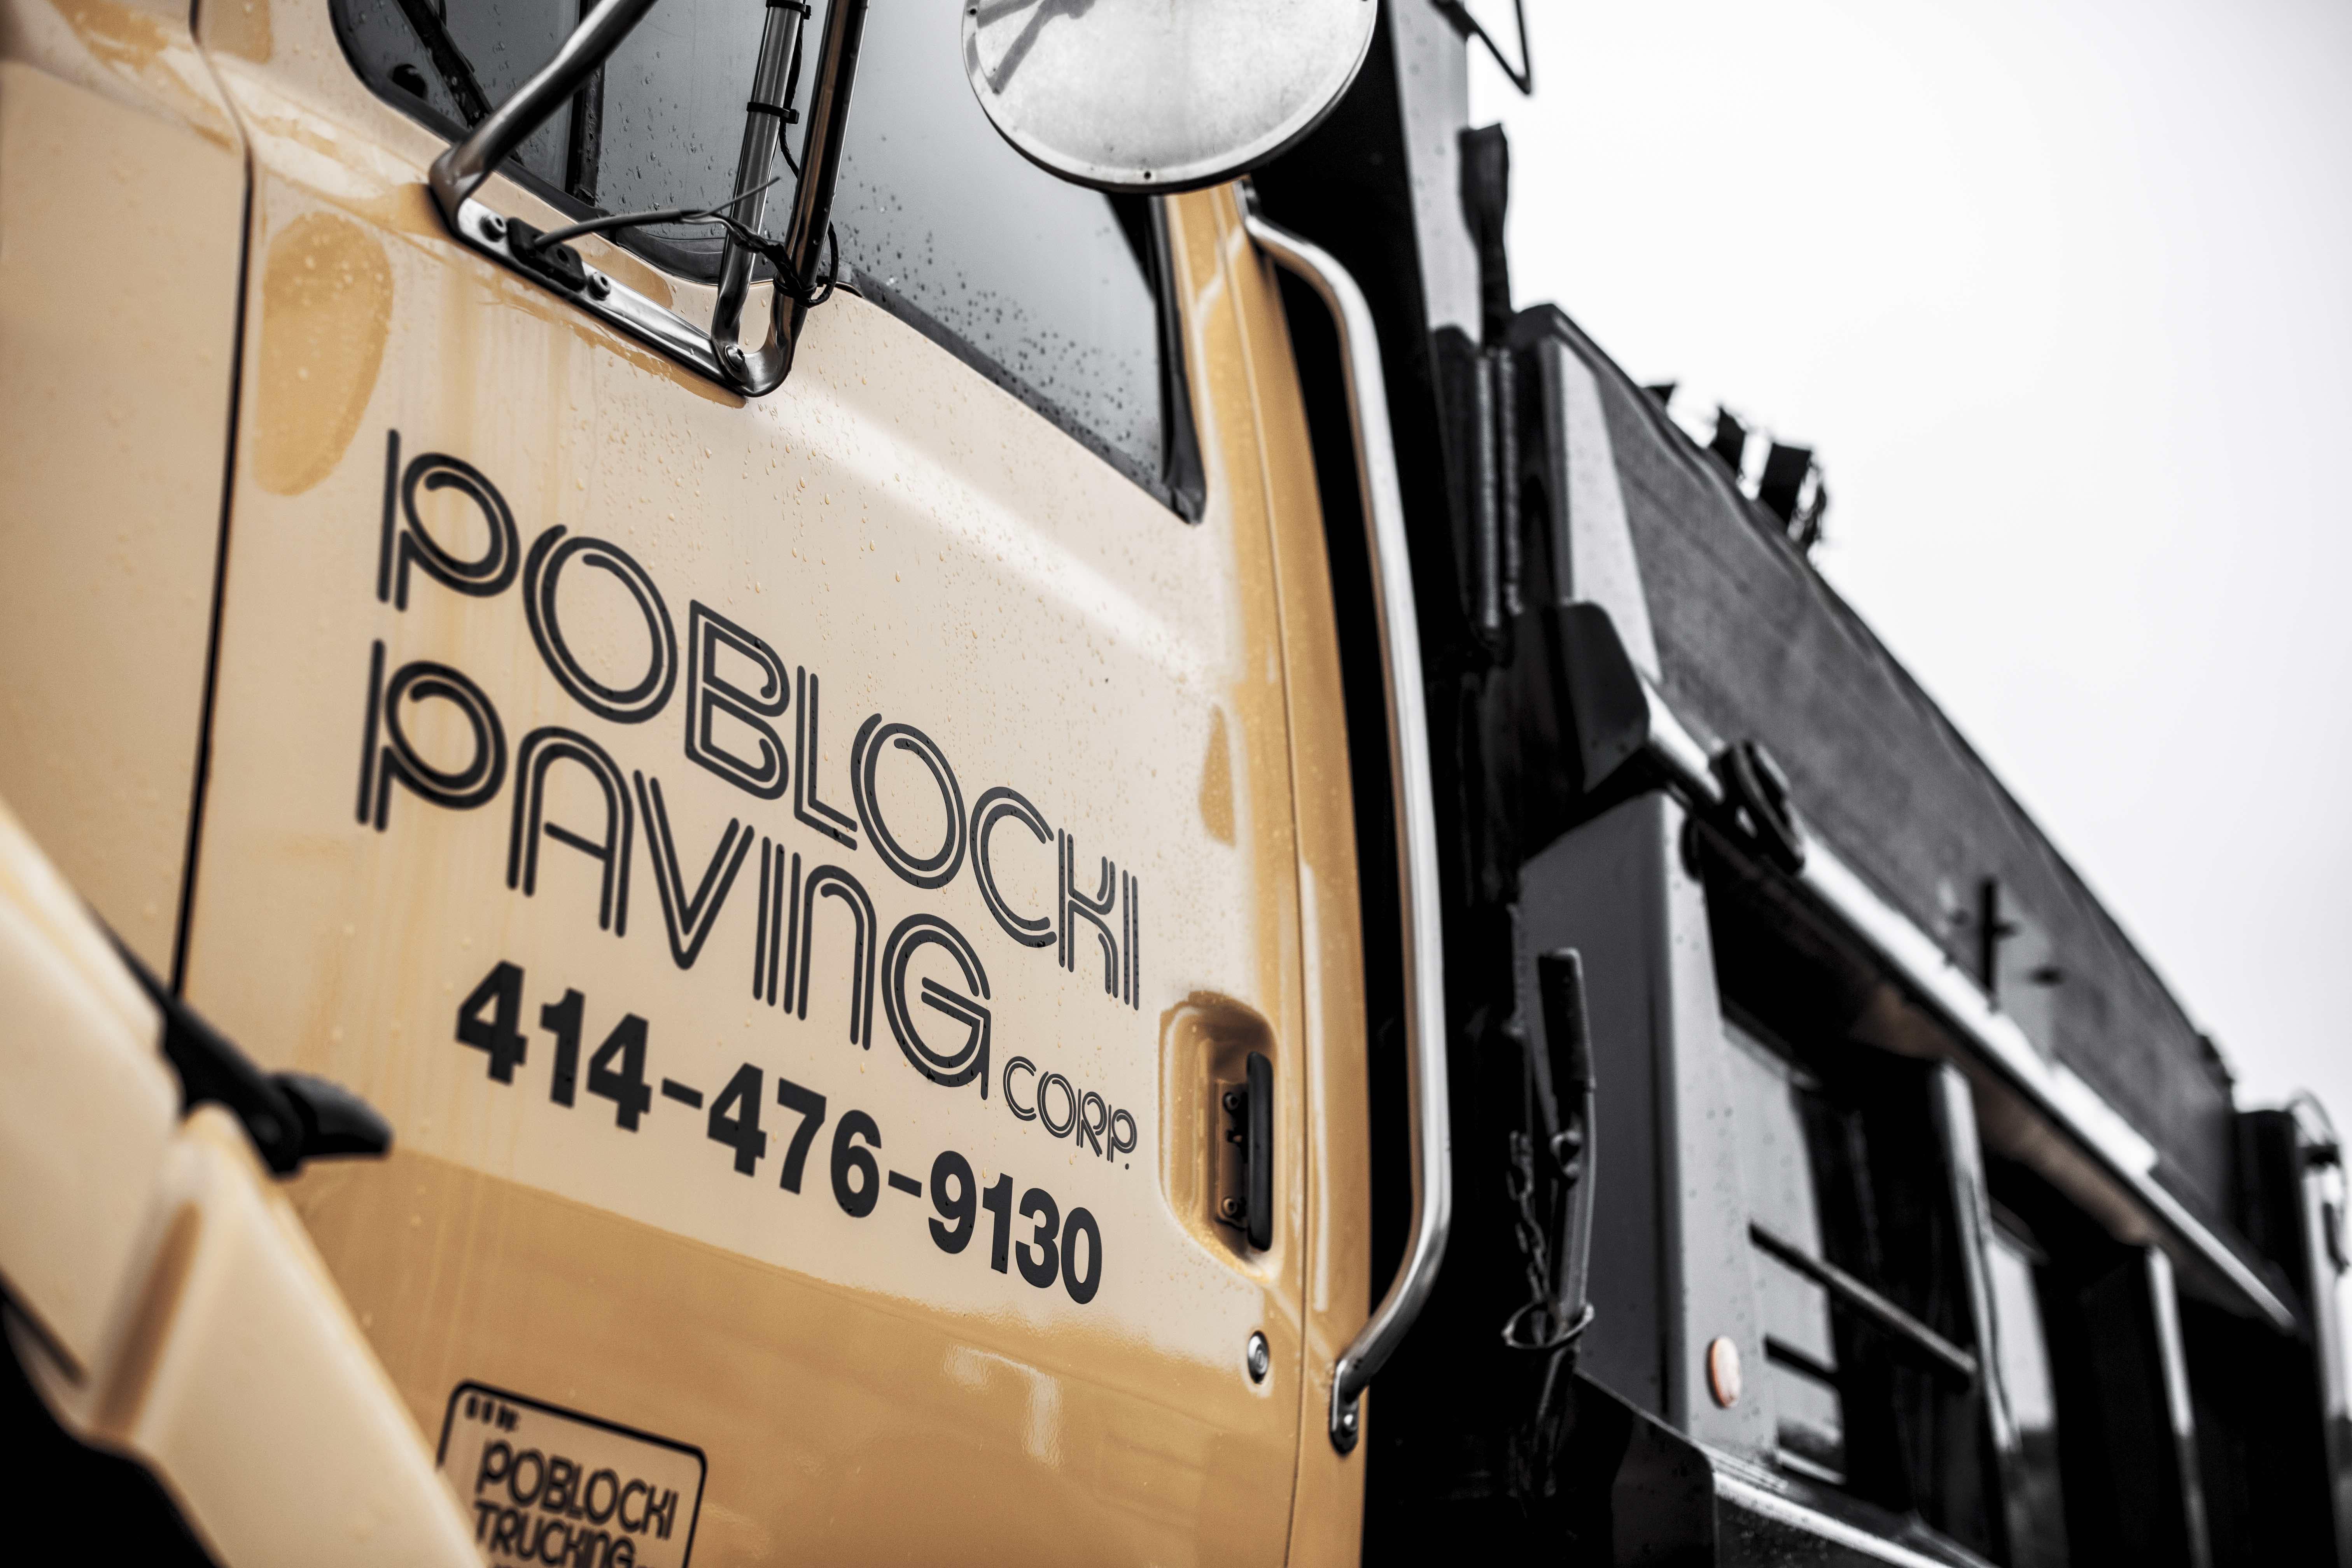 Poblocki_Truck_Small.jpg